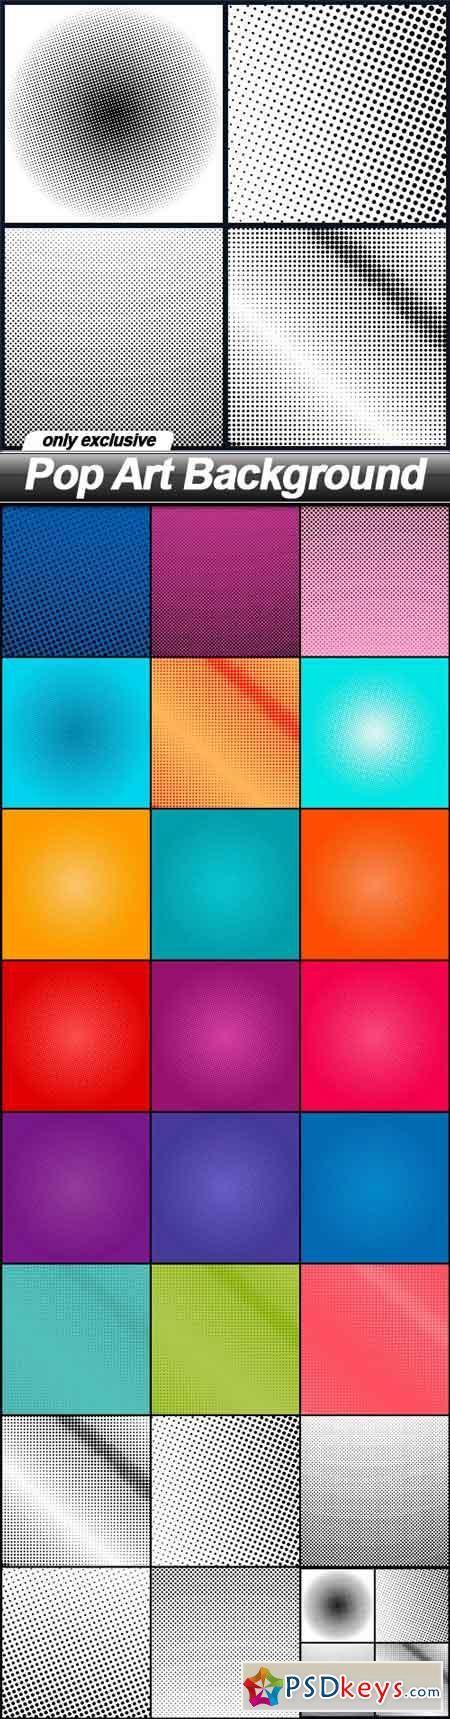 Pop Art Background - 24 EPS